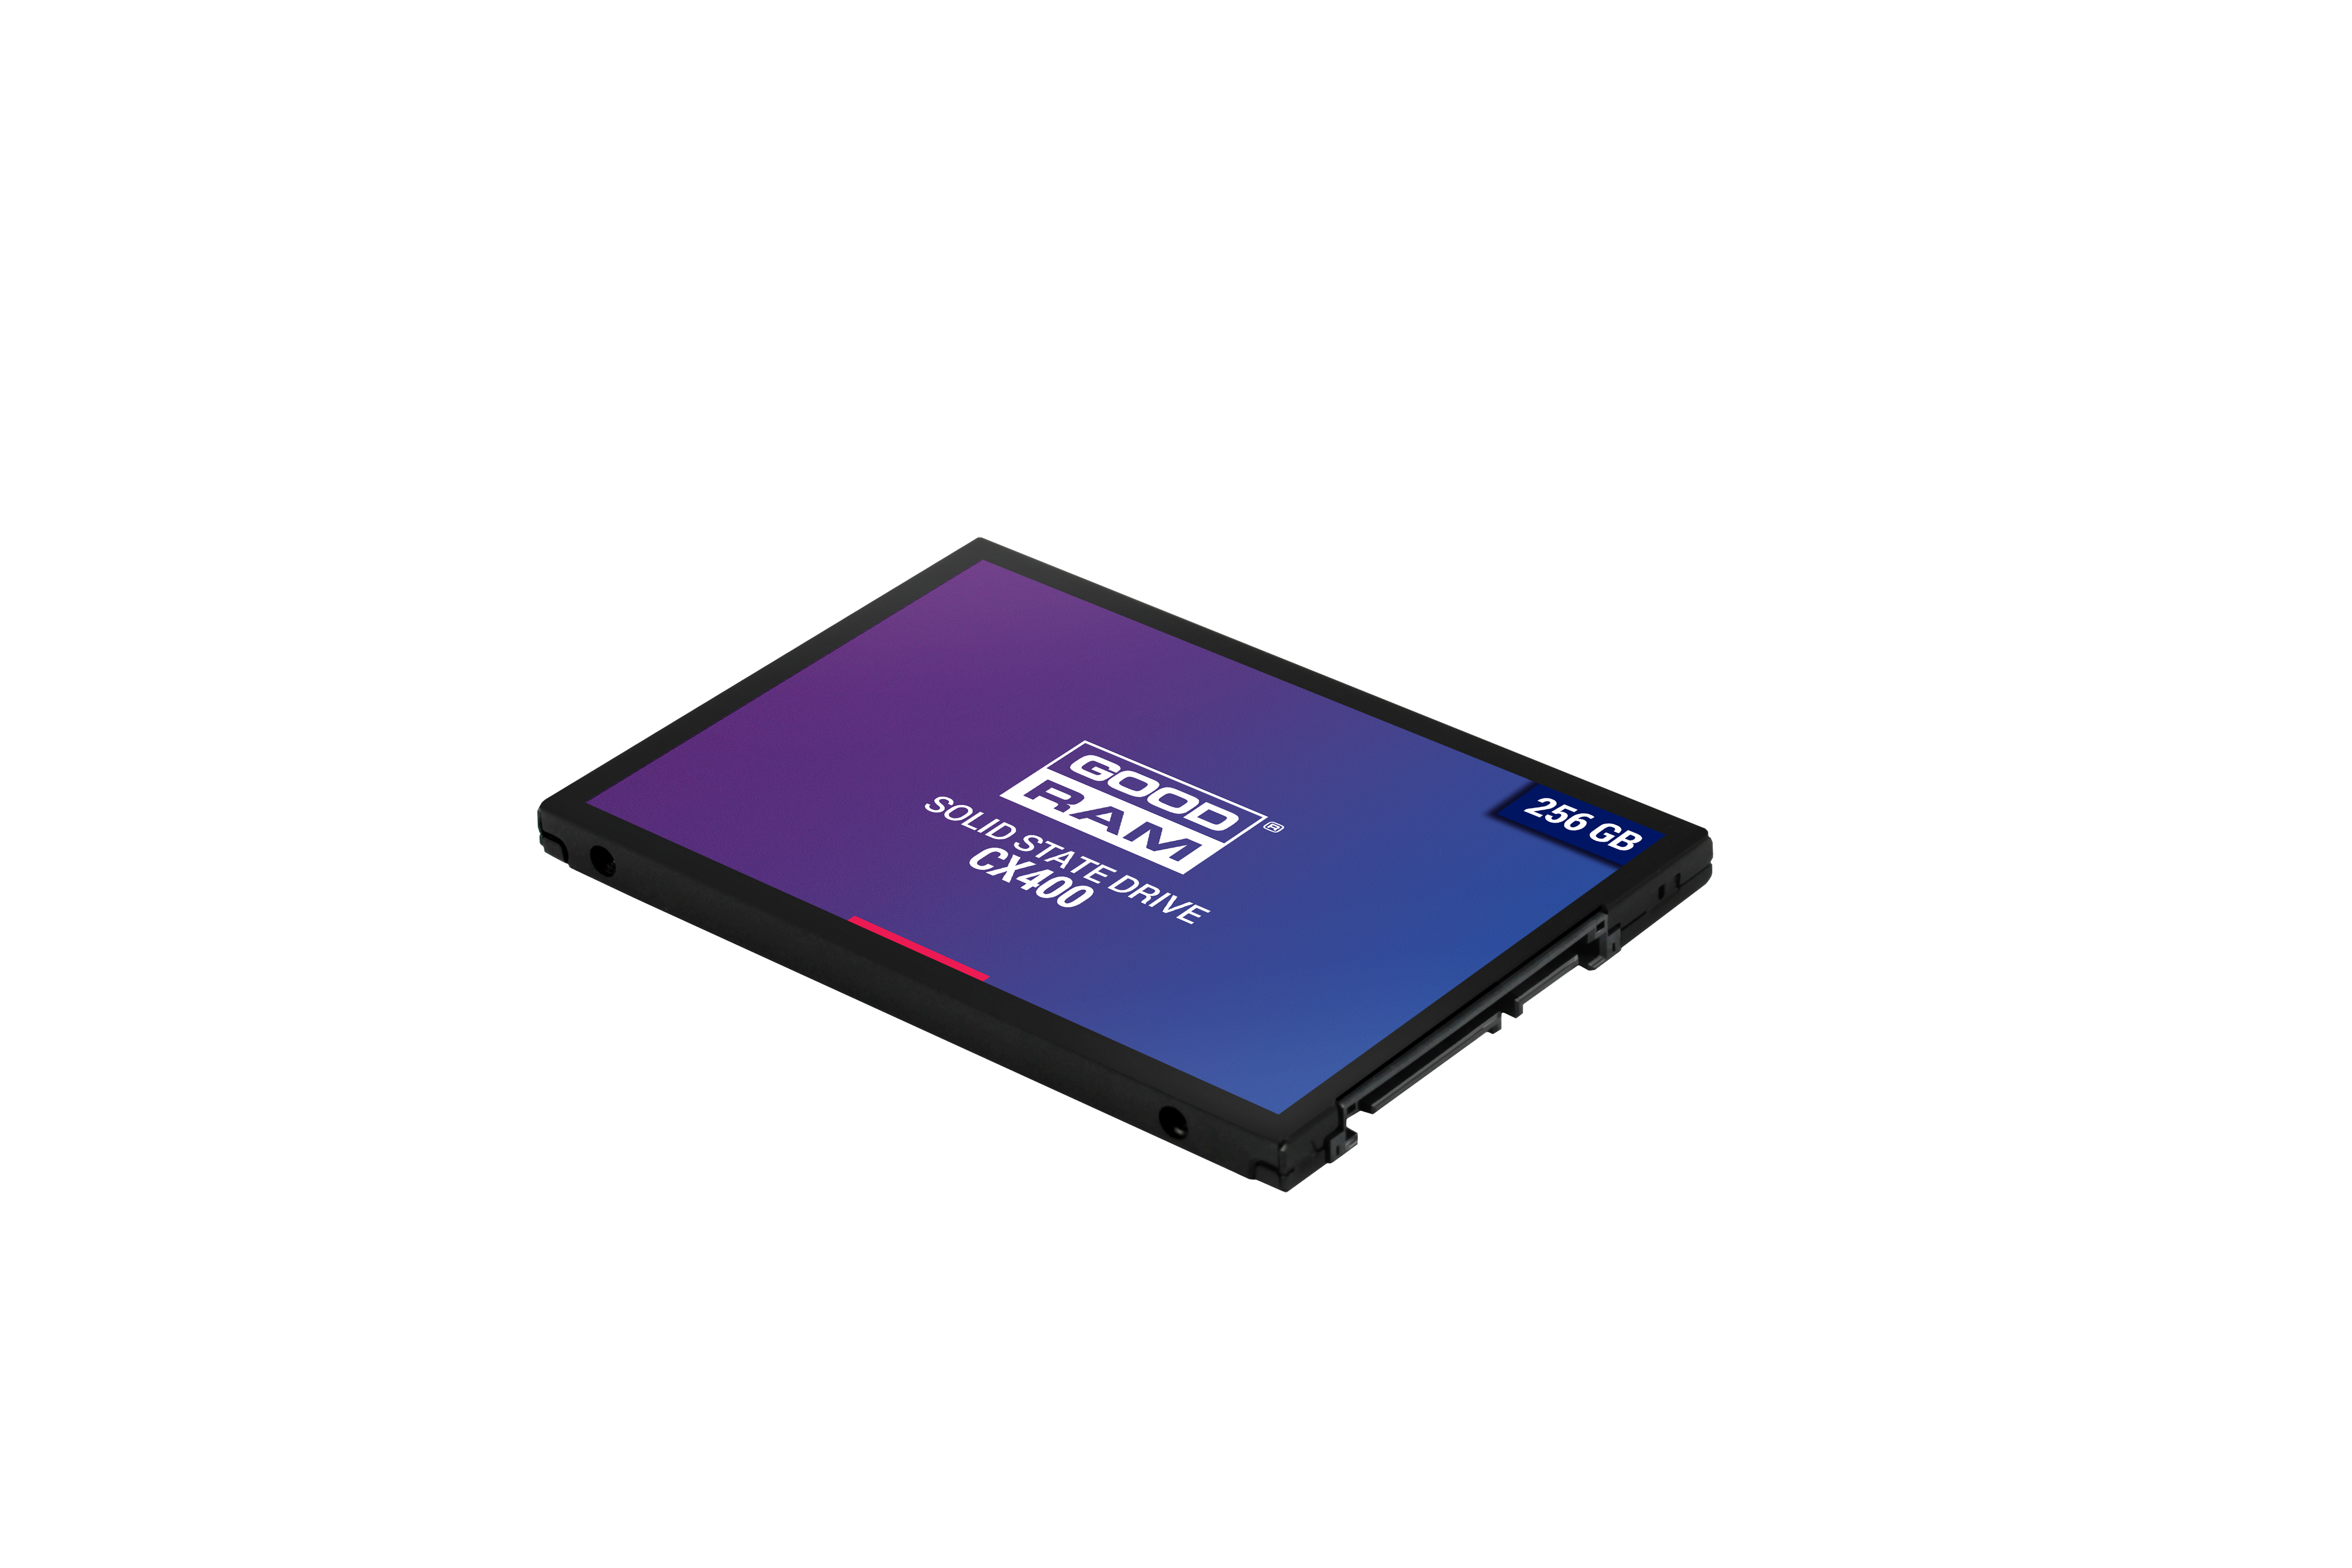 GOODRAM SSD 256 SATA III 2,5 RETAIL